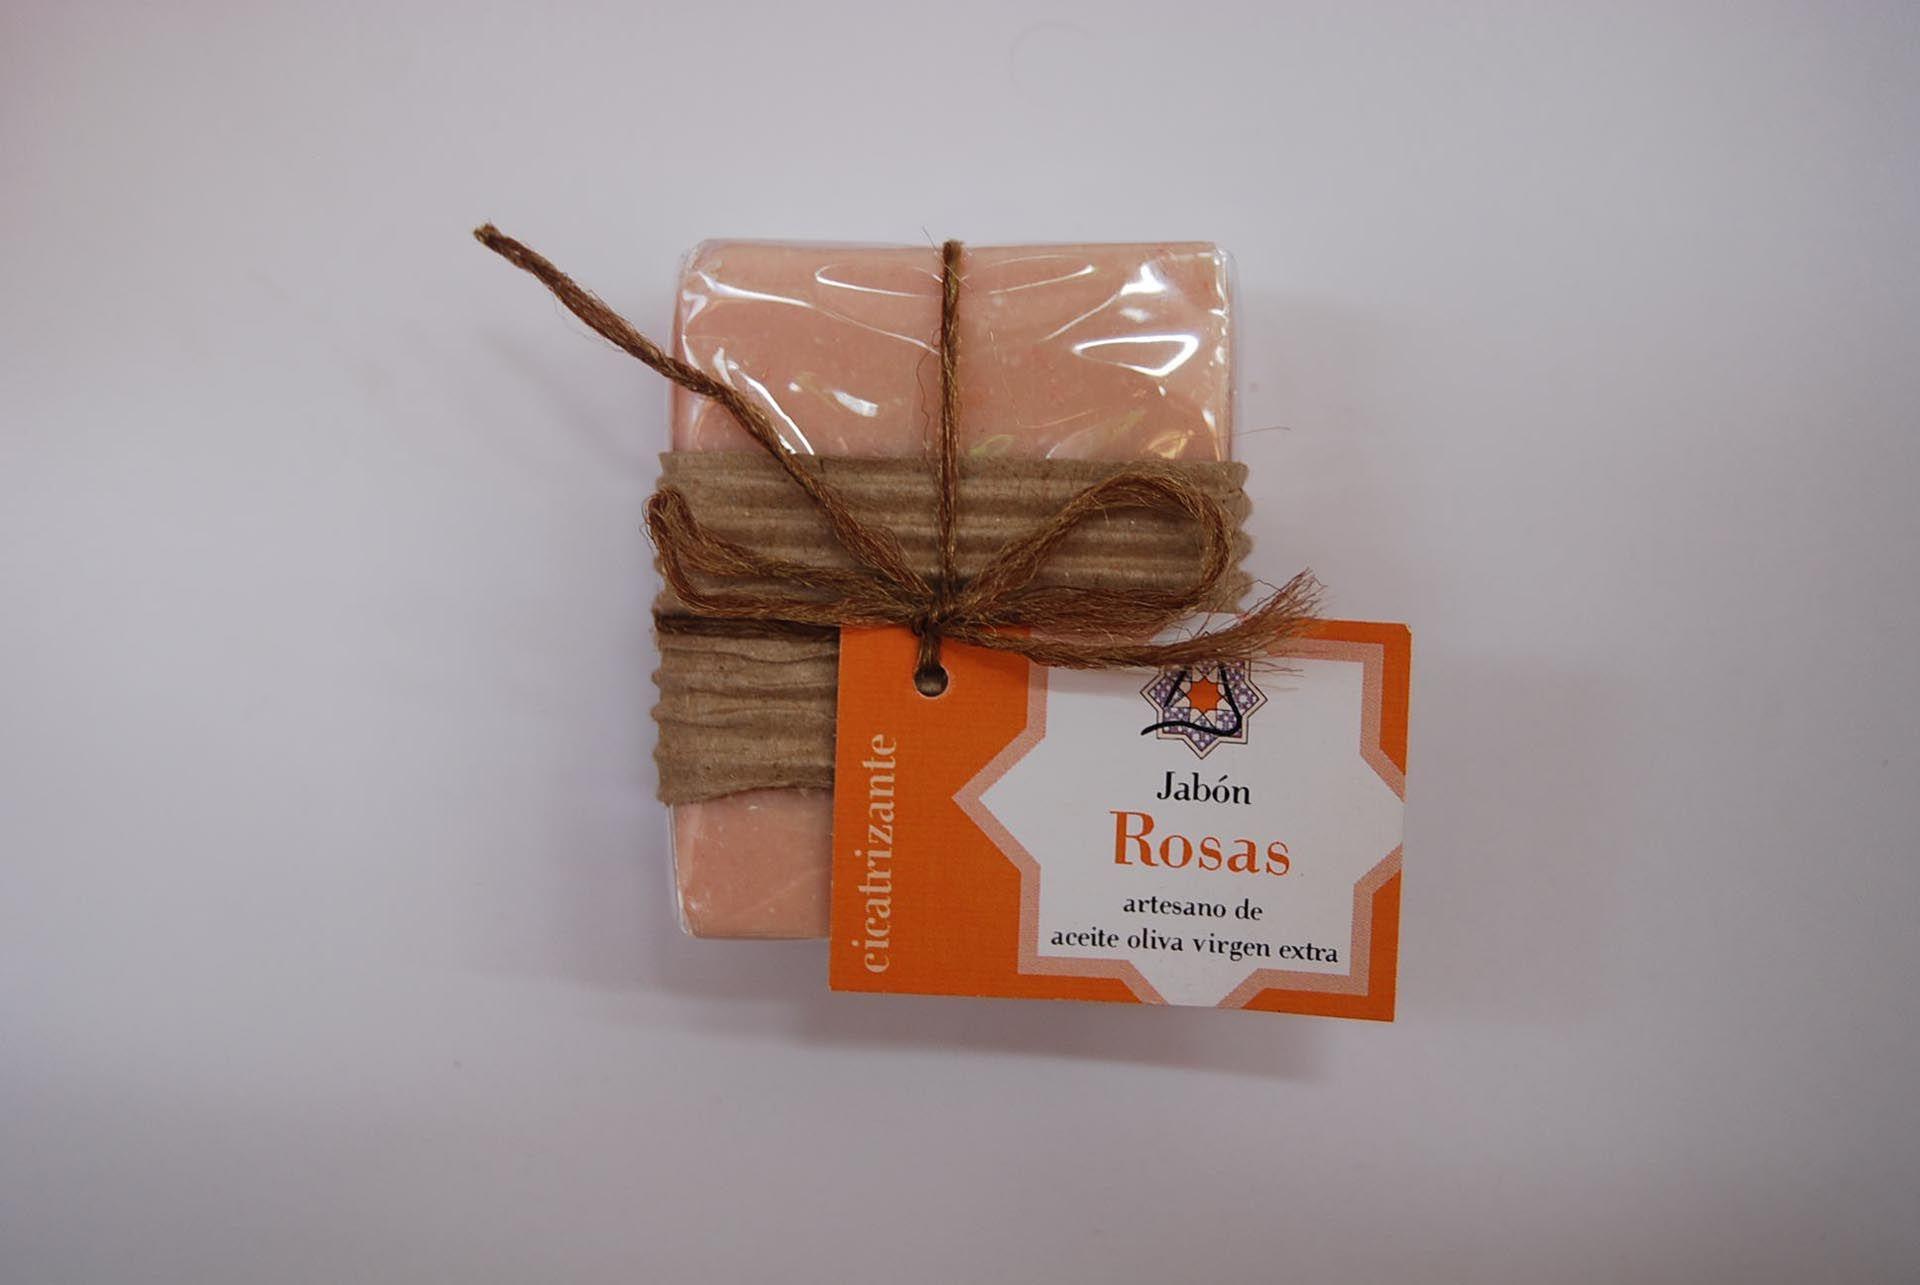 Jabón artesano de rosas: Productos de Arahí